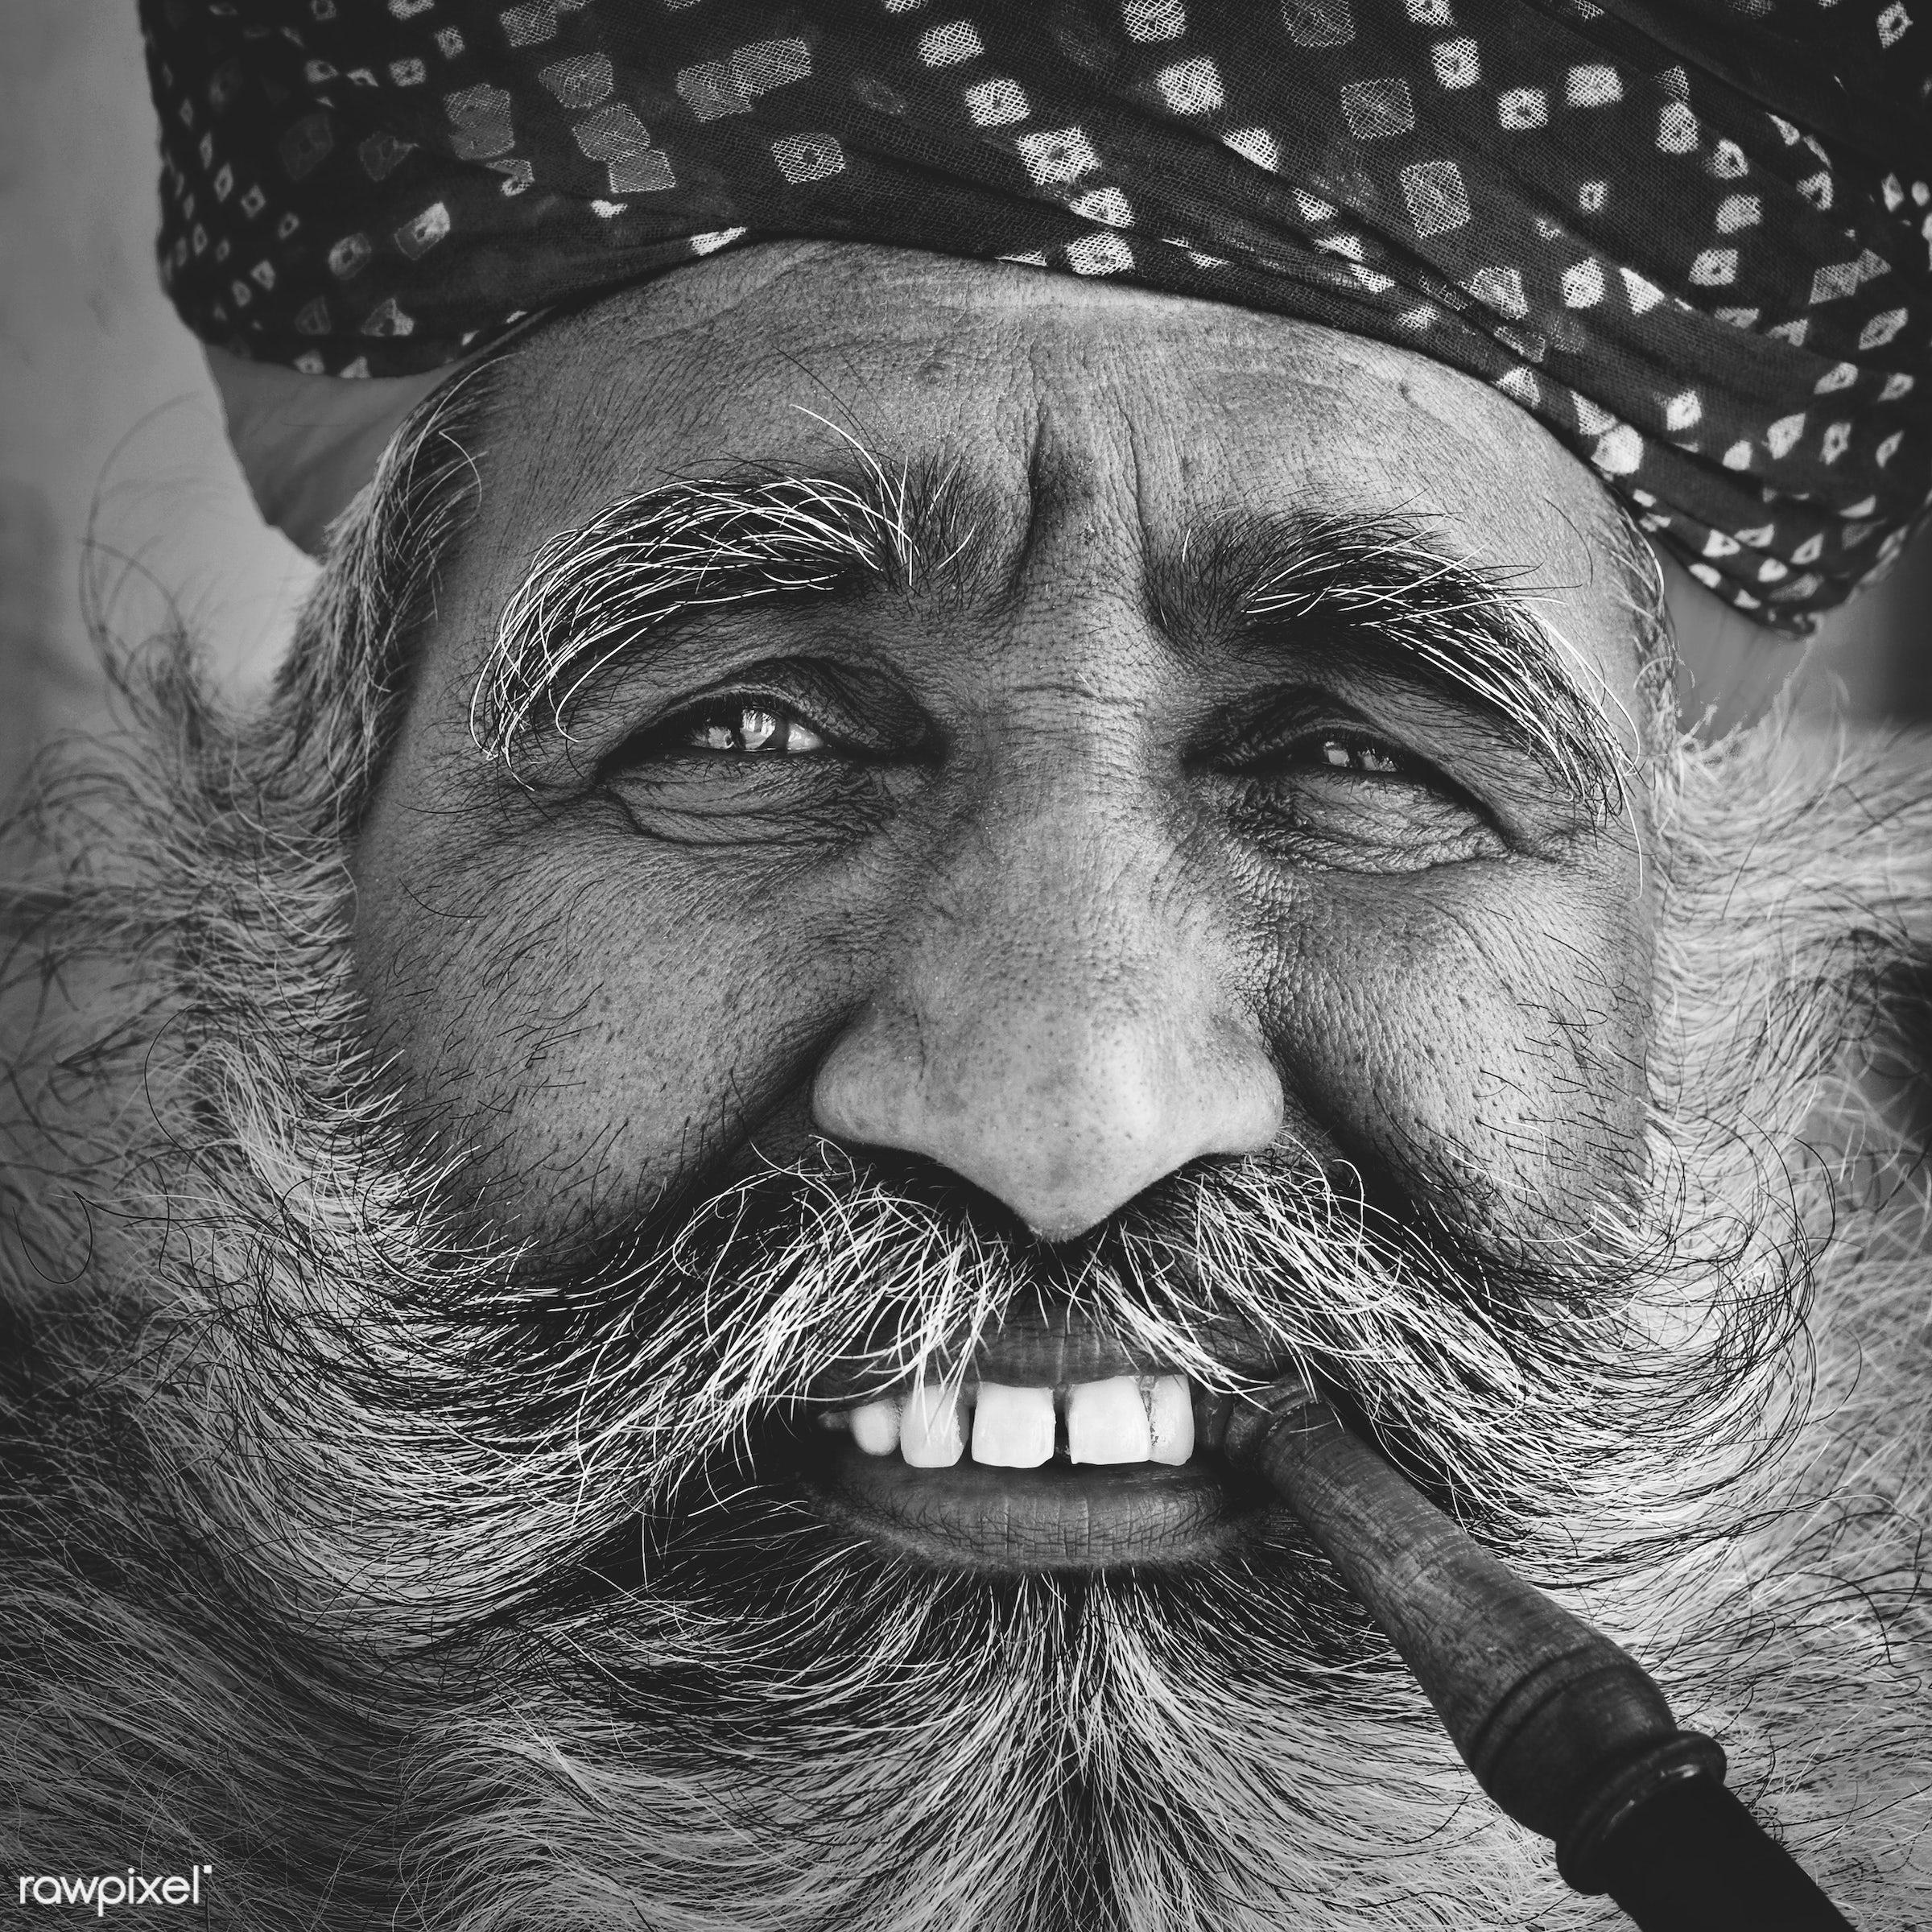 Bearded Indian man smoking a pipe - adult, asia, beard, brahmin, characters, face, fine art portrait, human face, india,...